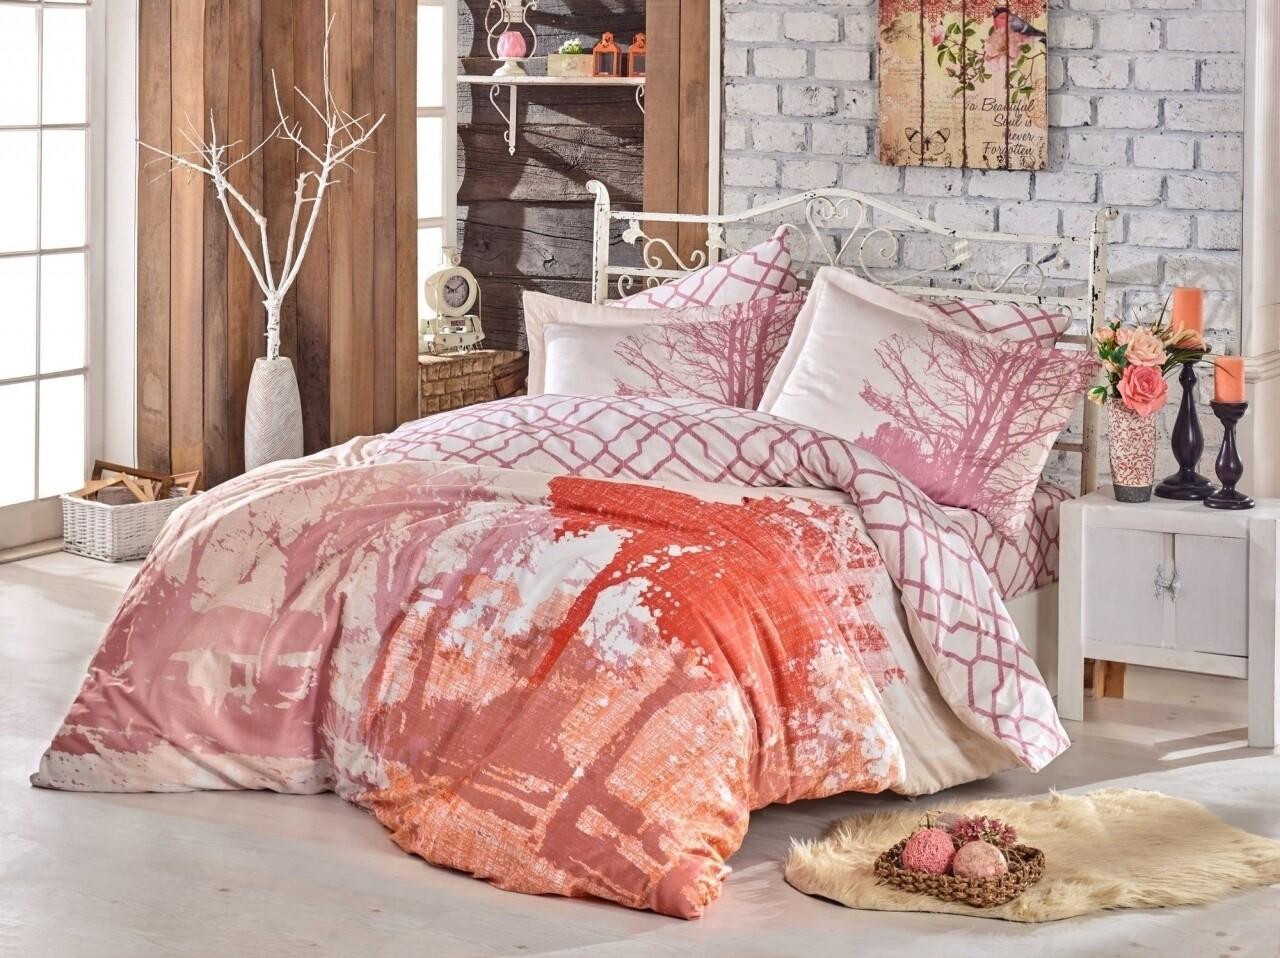 Lenjerie de pat dubla, 6 piese, 240x260 cm, 100% bumbac satinat, Hobby, Alandra Rose, roz